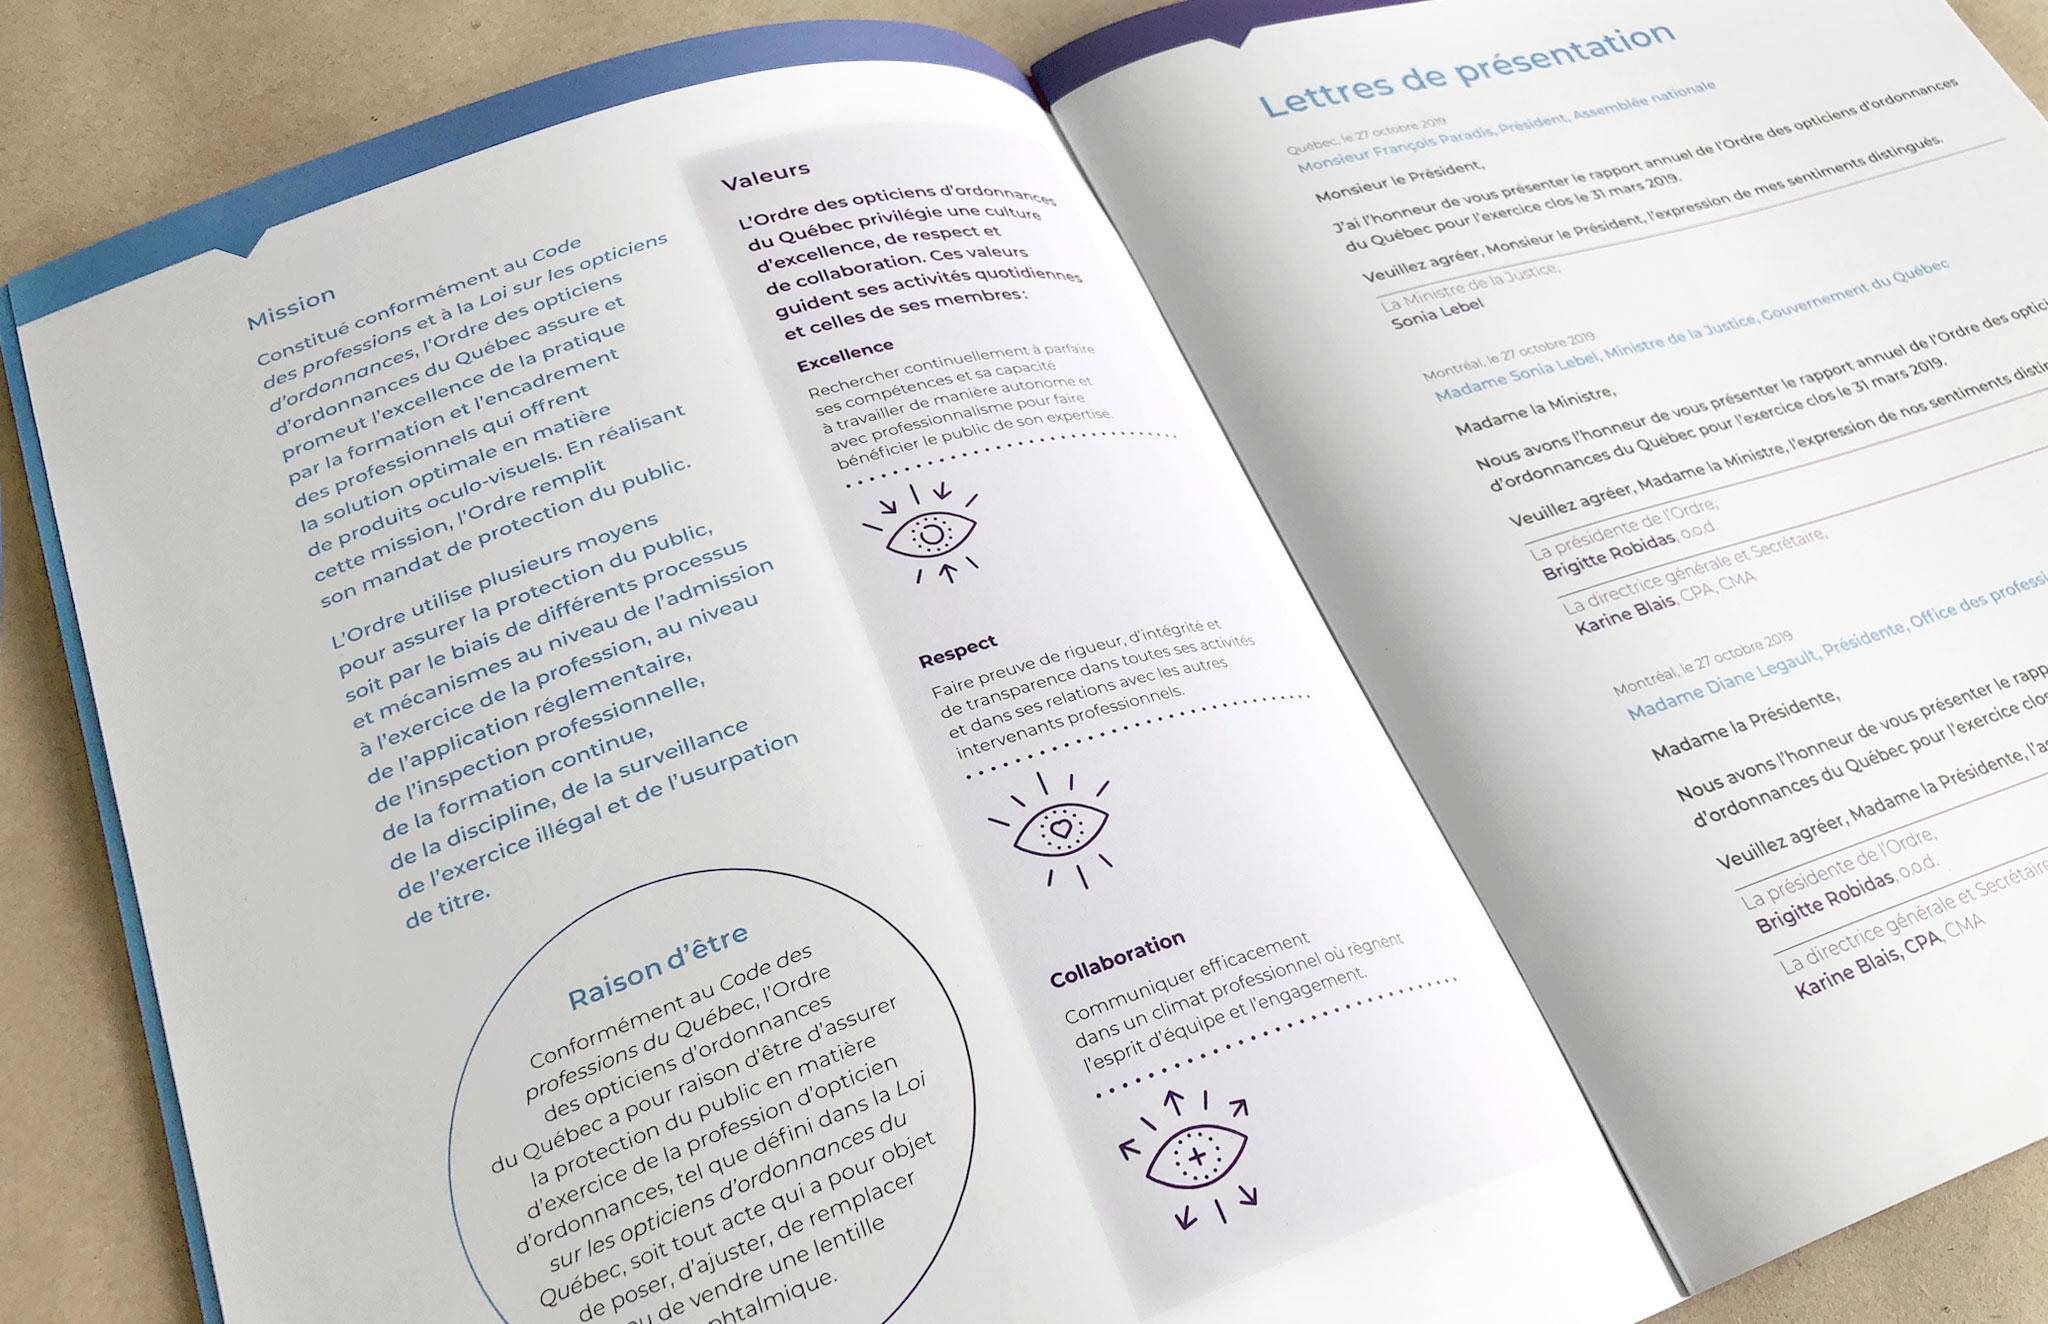 Rapport annuel de l'Ordre des opticiens du Québec.